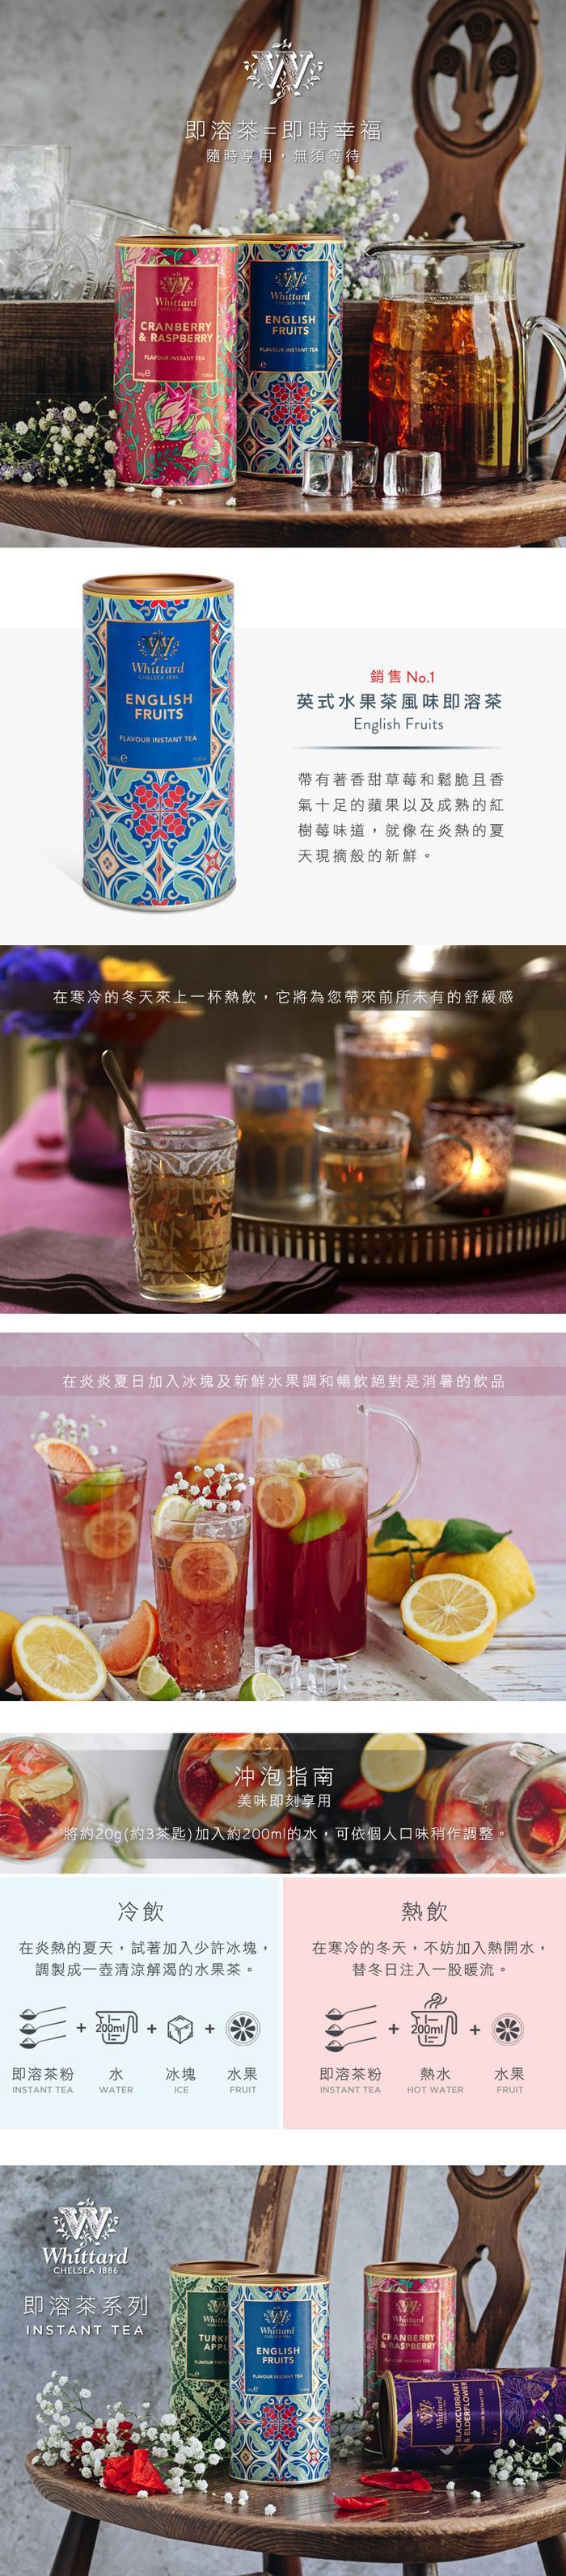 Whittard | 英式水果茶風味即溶茶